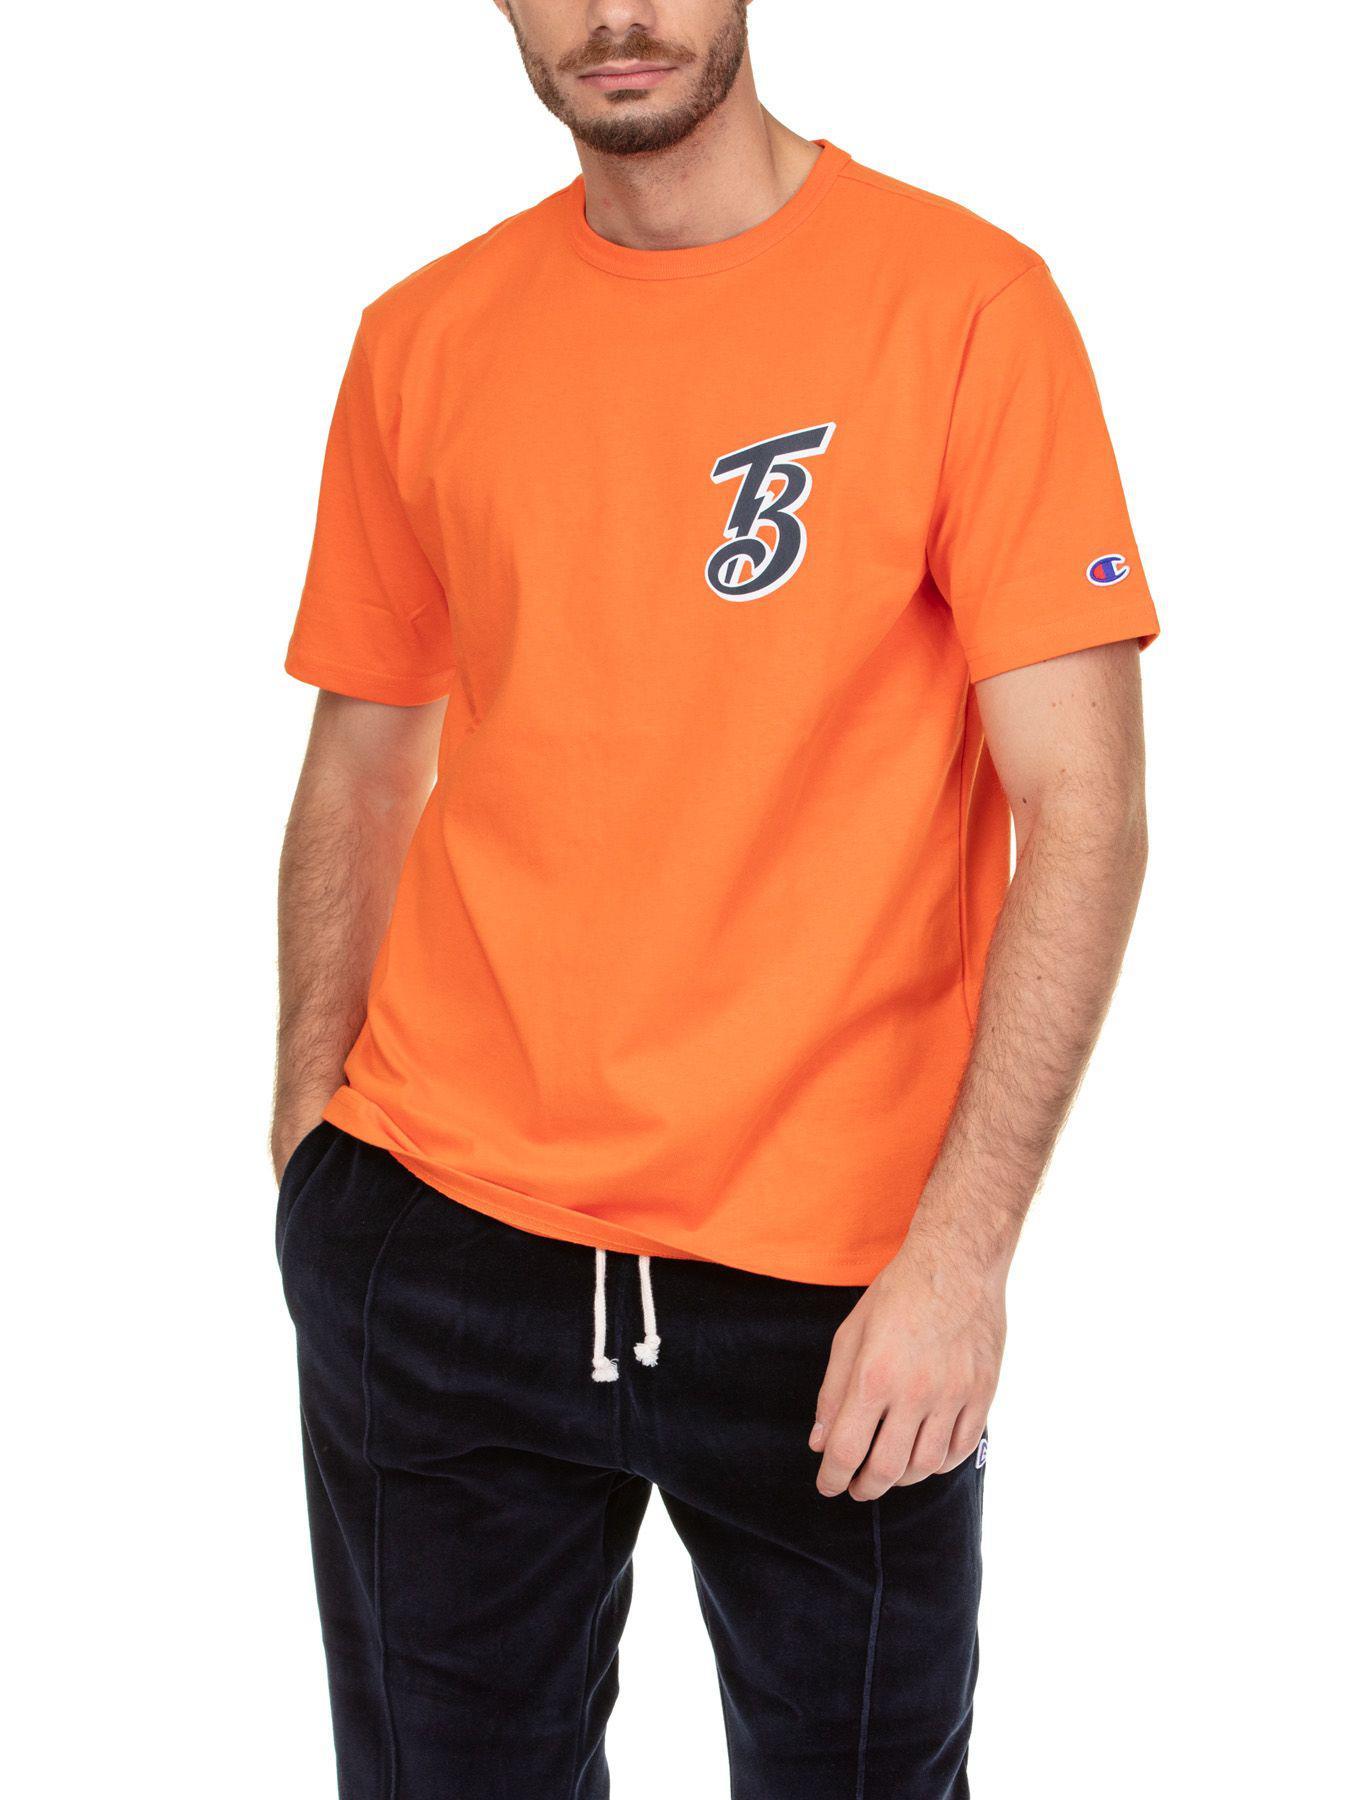 b92bb935 Champion Crewneck T-Shirt In Orange | ModeSens